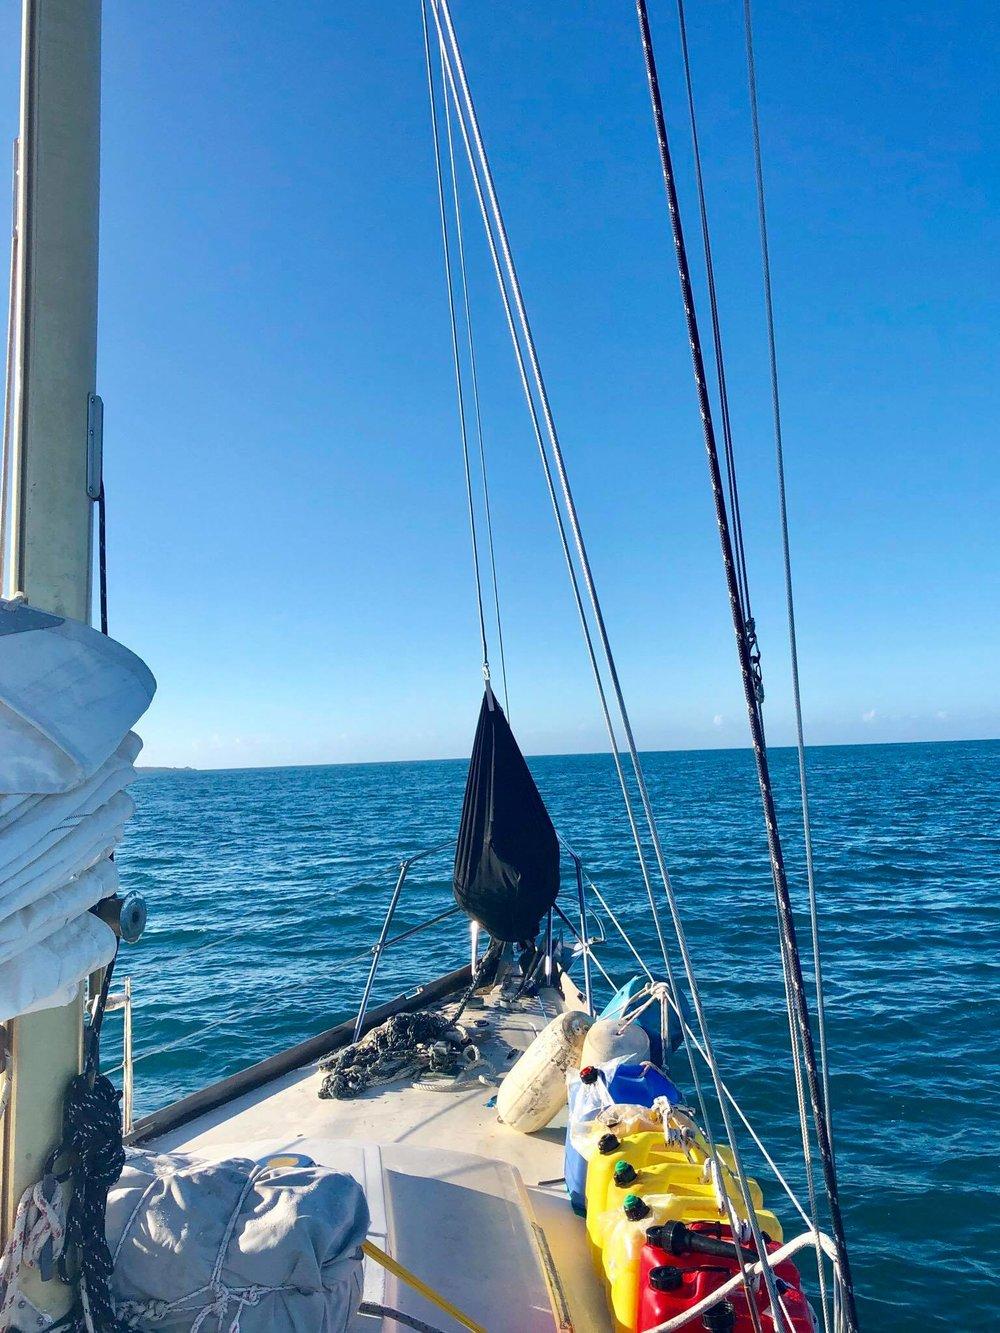 Sailing Life Day 309 Sailing (actually motoring) from Puerto Real to Boqueron, Puerto Rico2.jpg